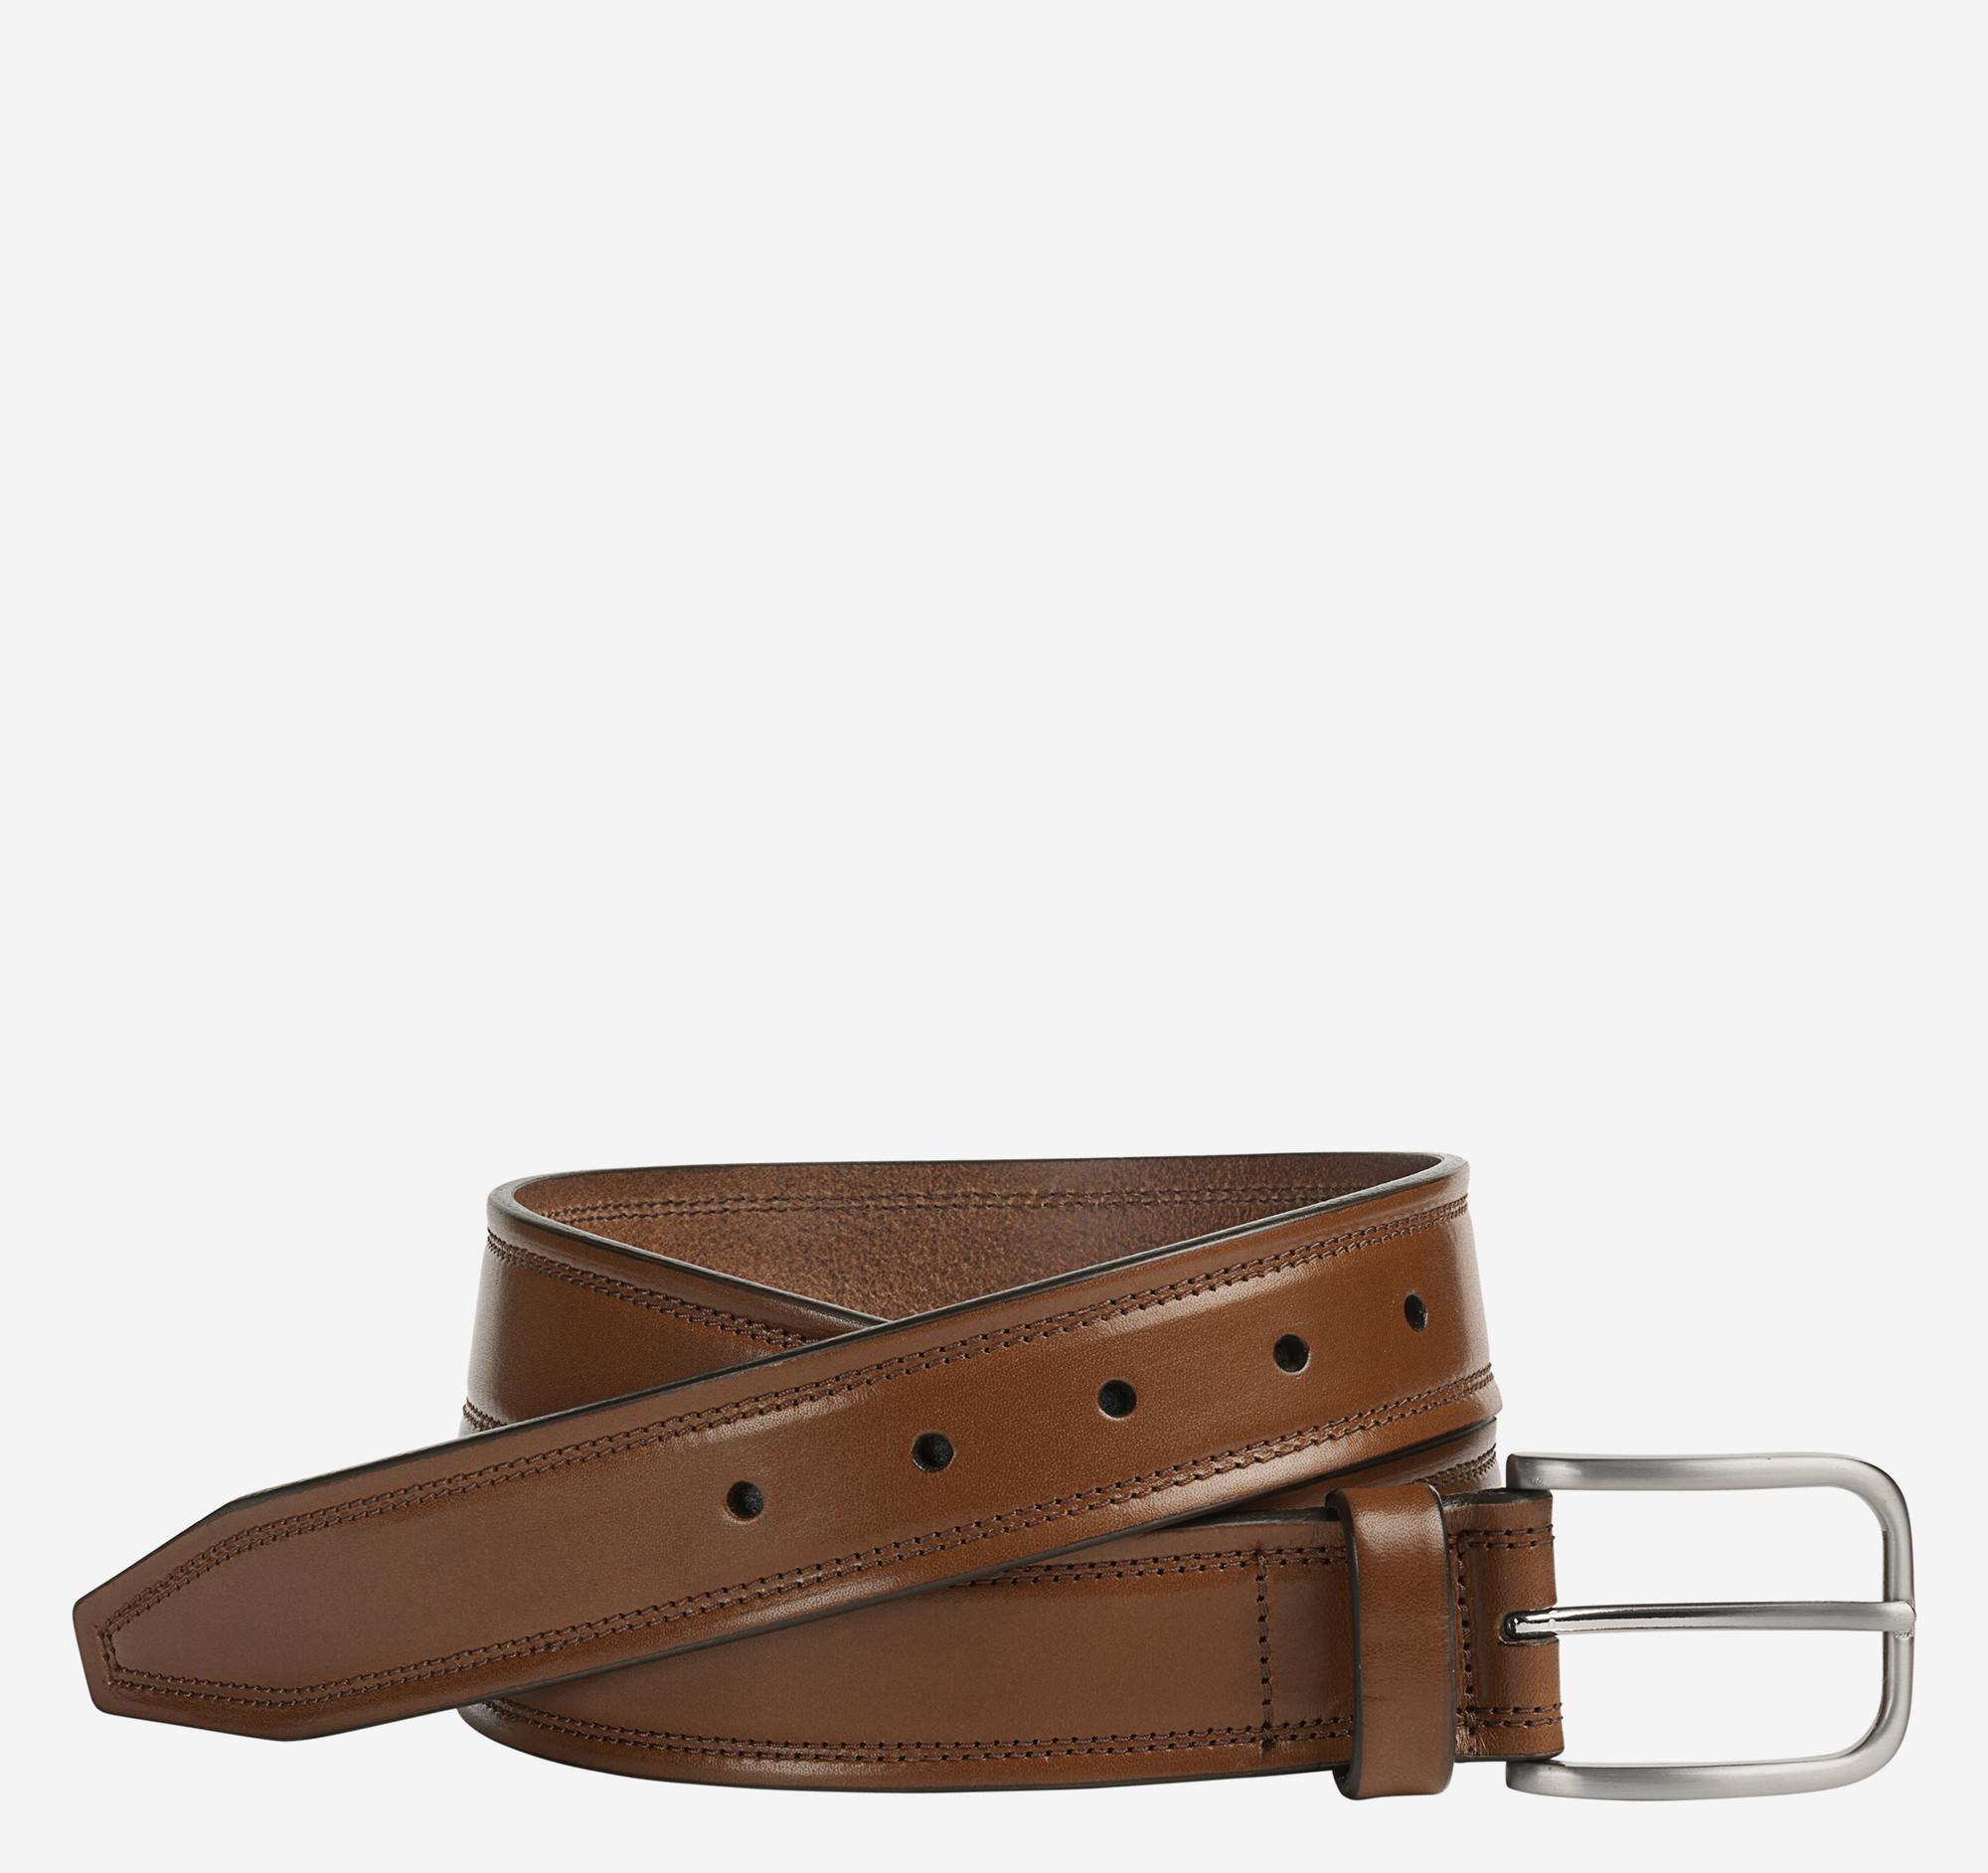 Johnston & Murphy Double Self-Stitch Belt